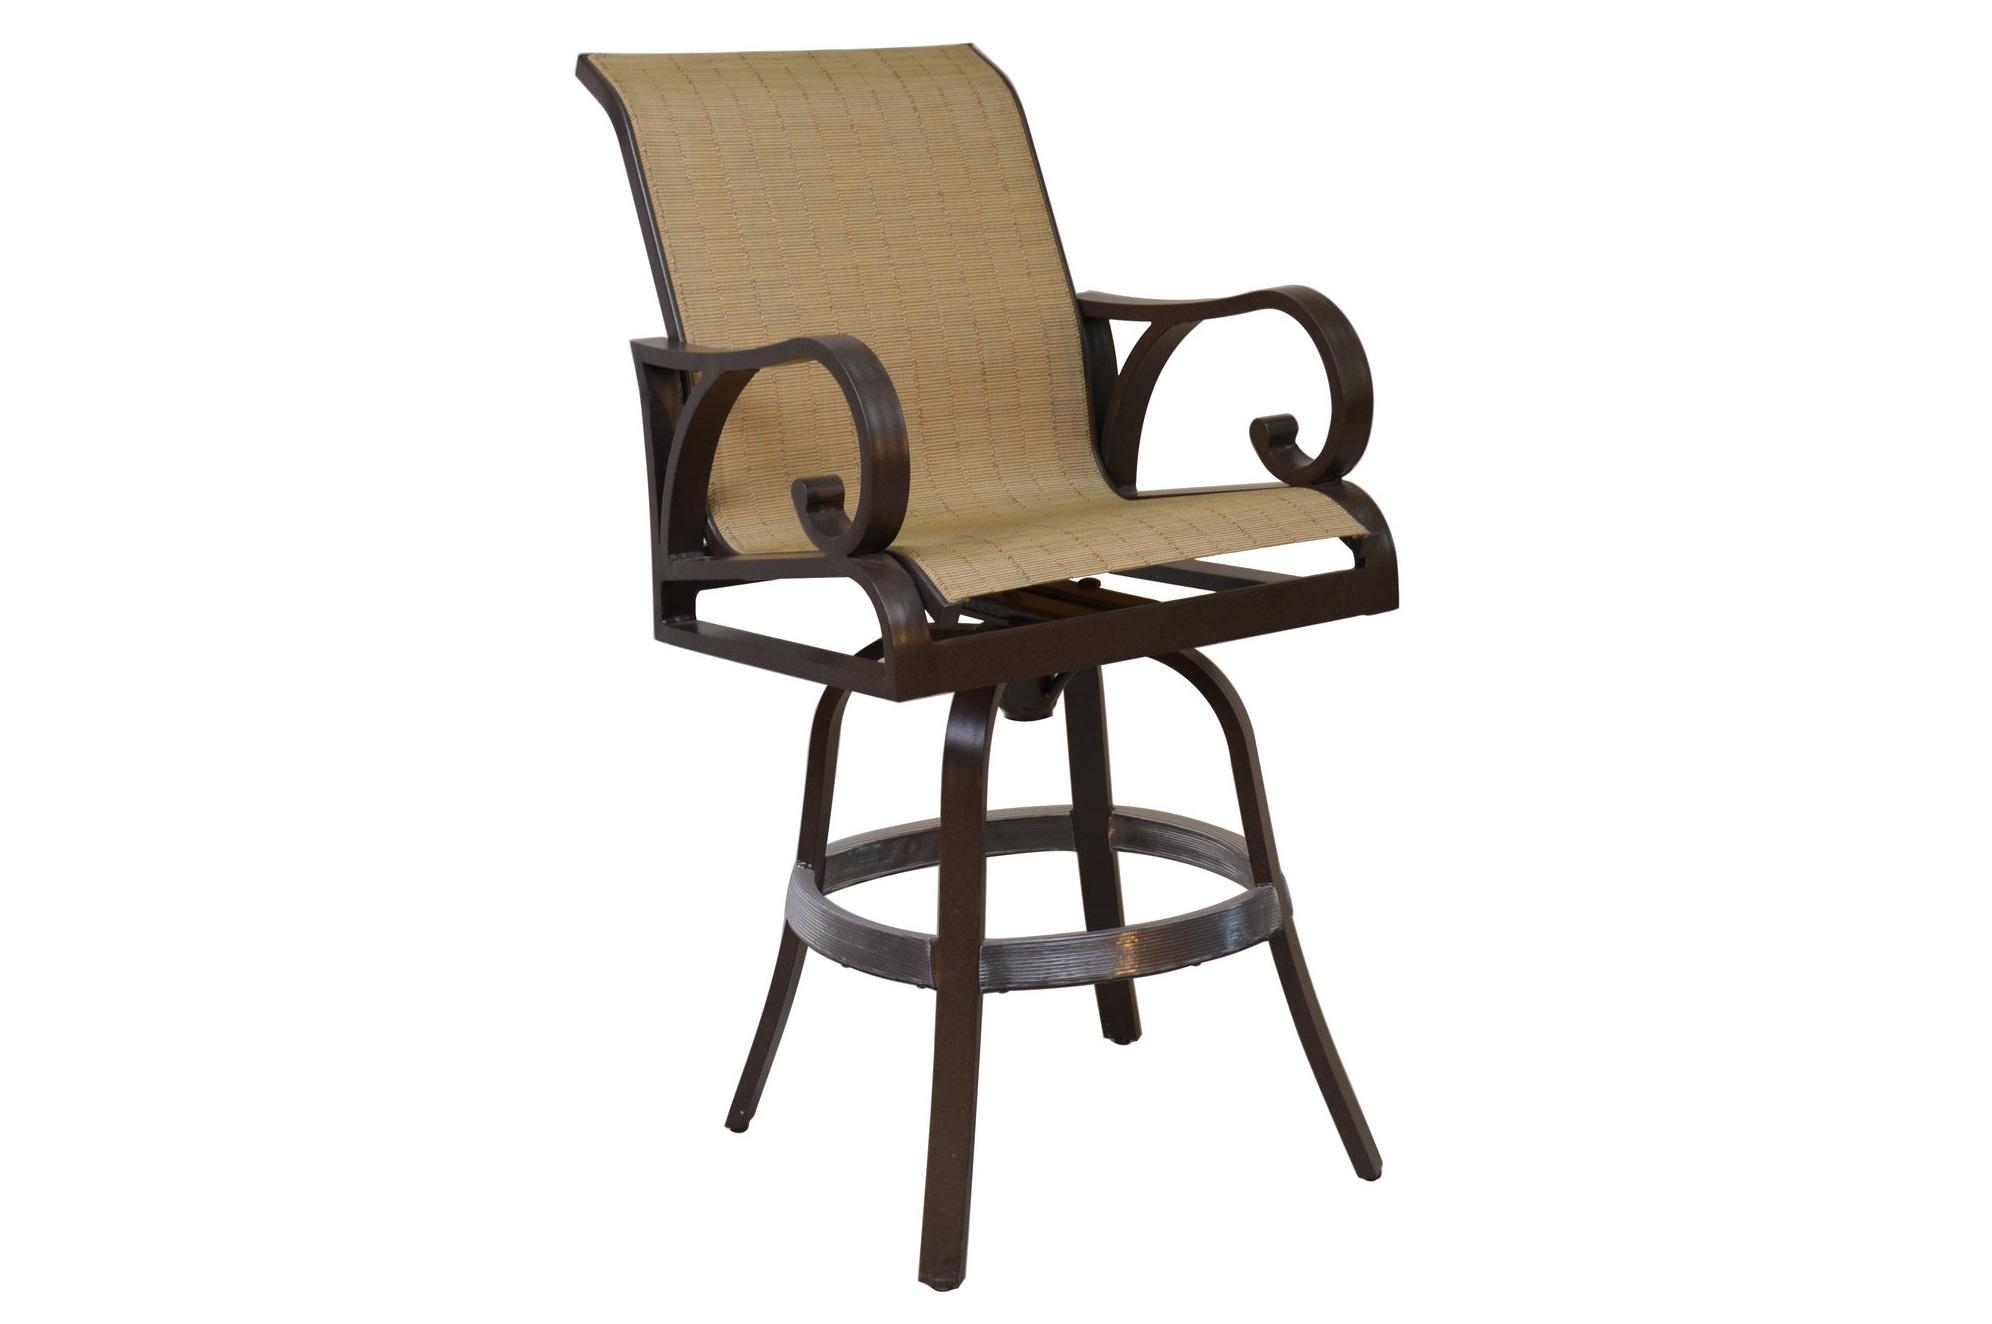 601508 Key Largo Swivel Bar Chair   24.5 x 30 x 48.4